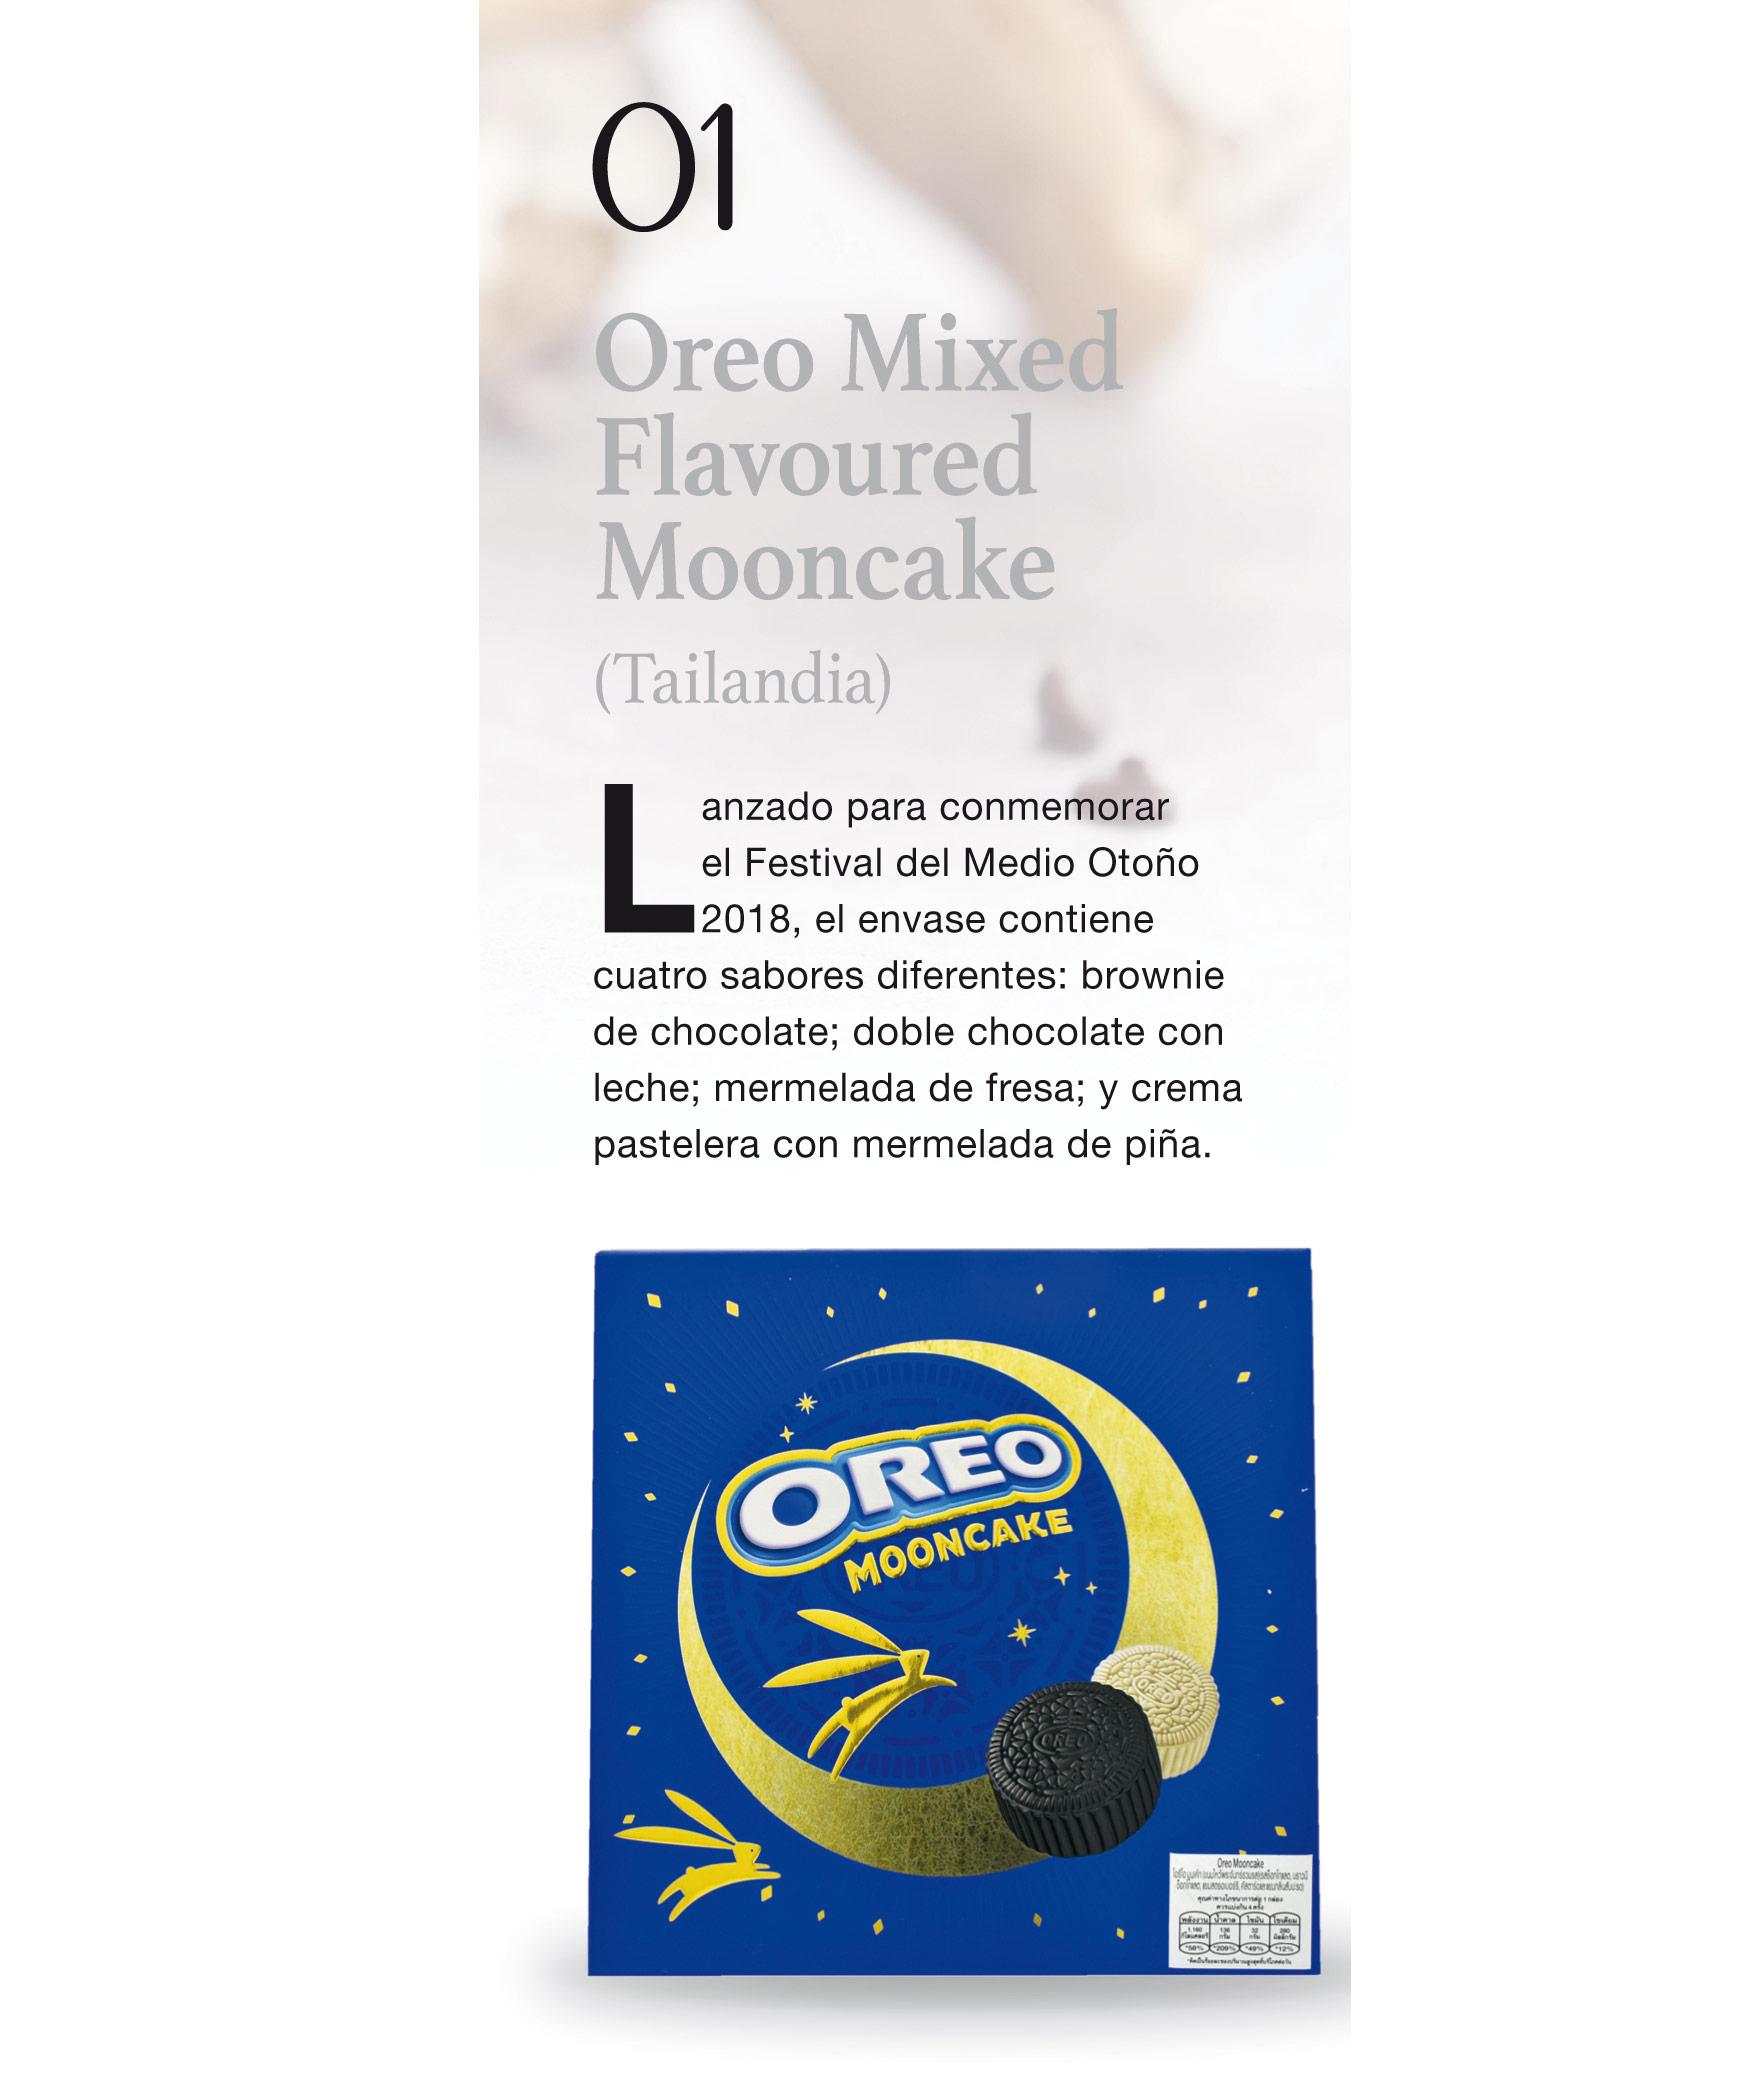 Oreo Mixed Flavoured Mooncake